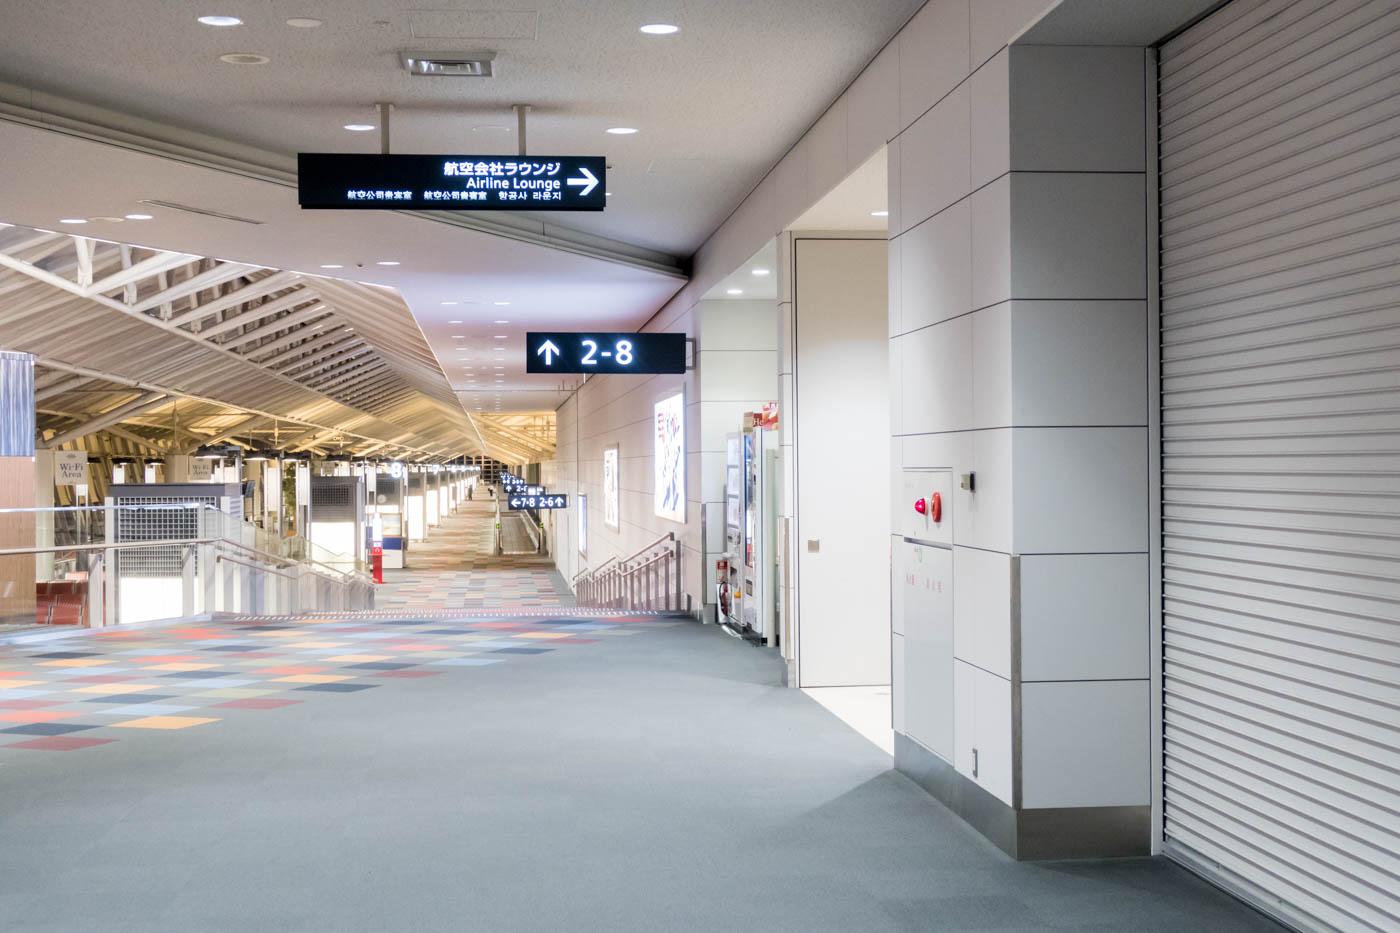 Nagoya Centrair Airport Domestic Terminal